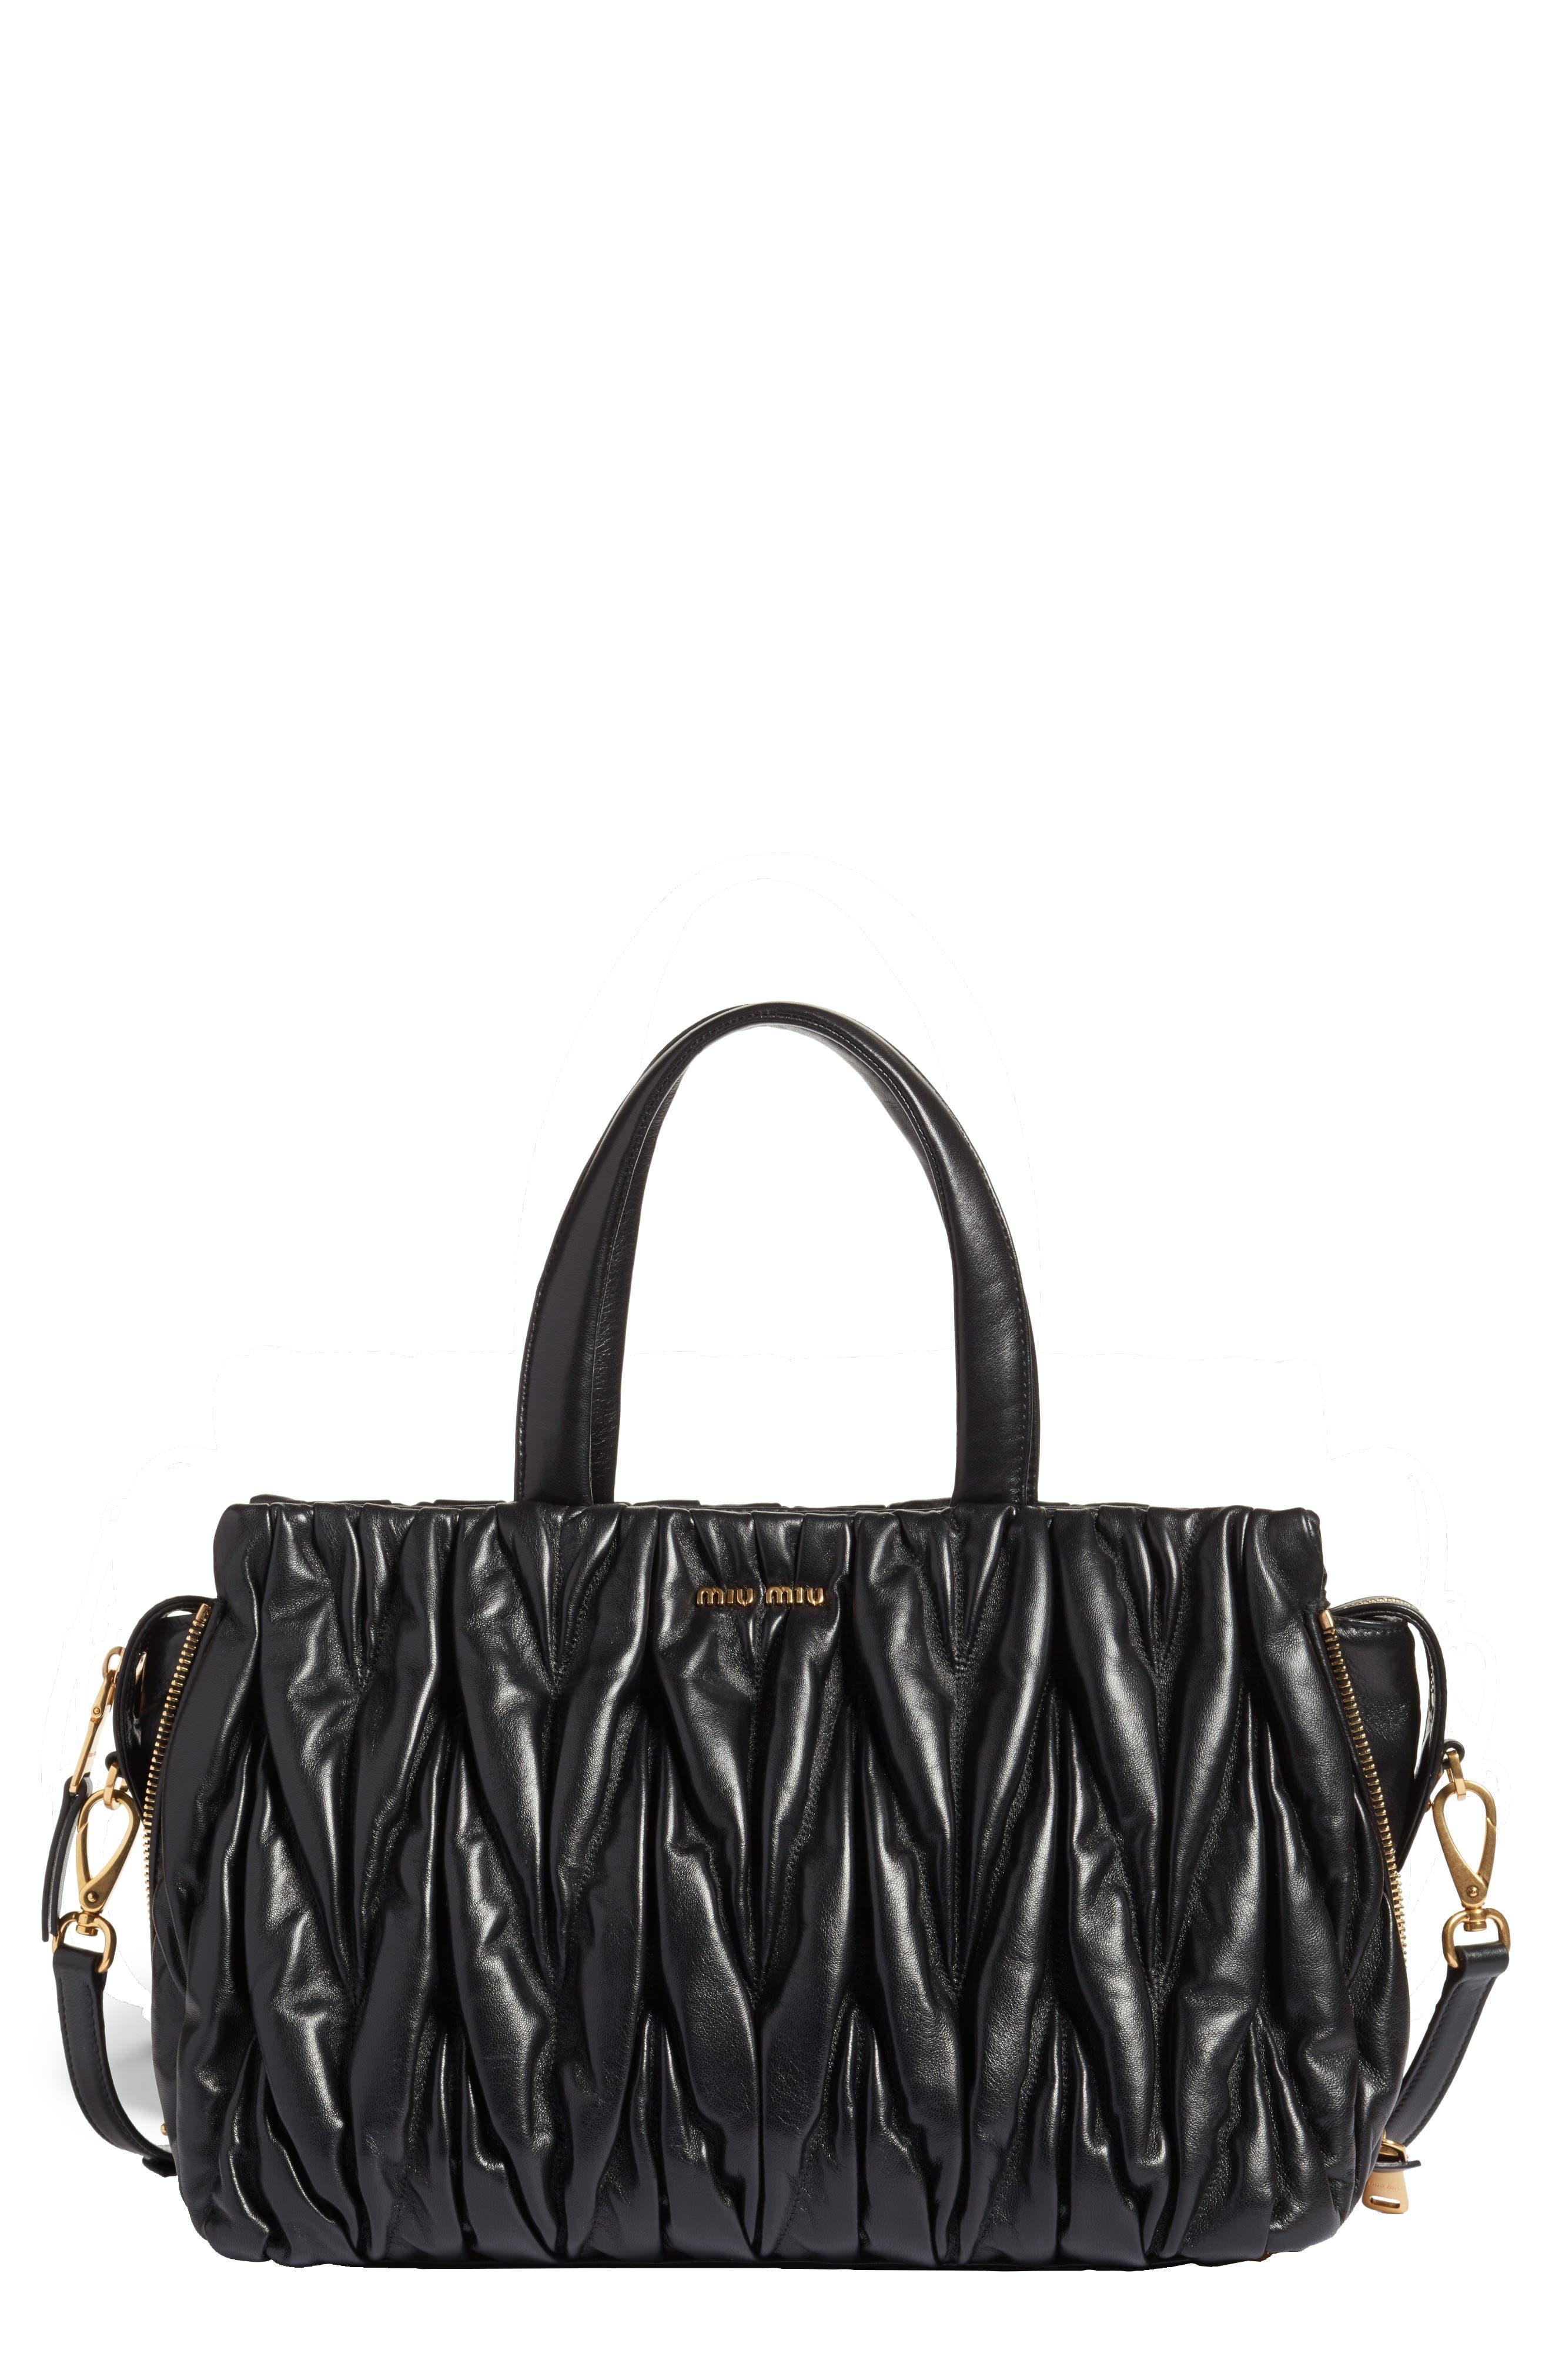 Alternate Image 1 Selected - Miu Miu Matelassé Leather Top Handle Satchel